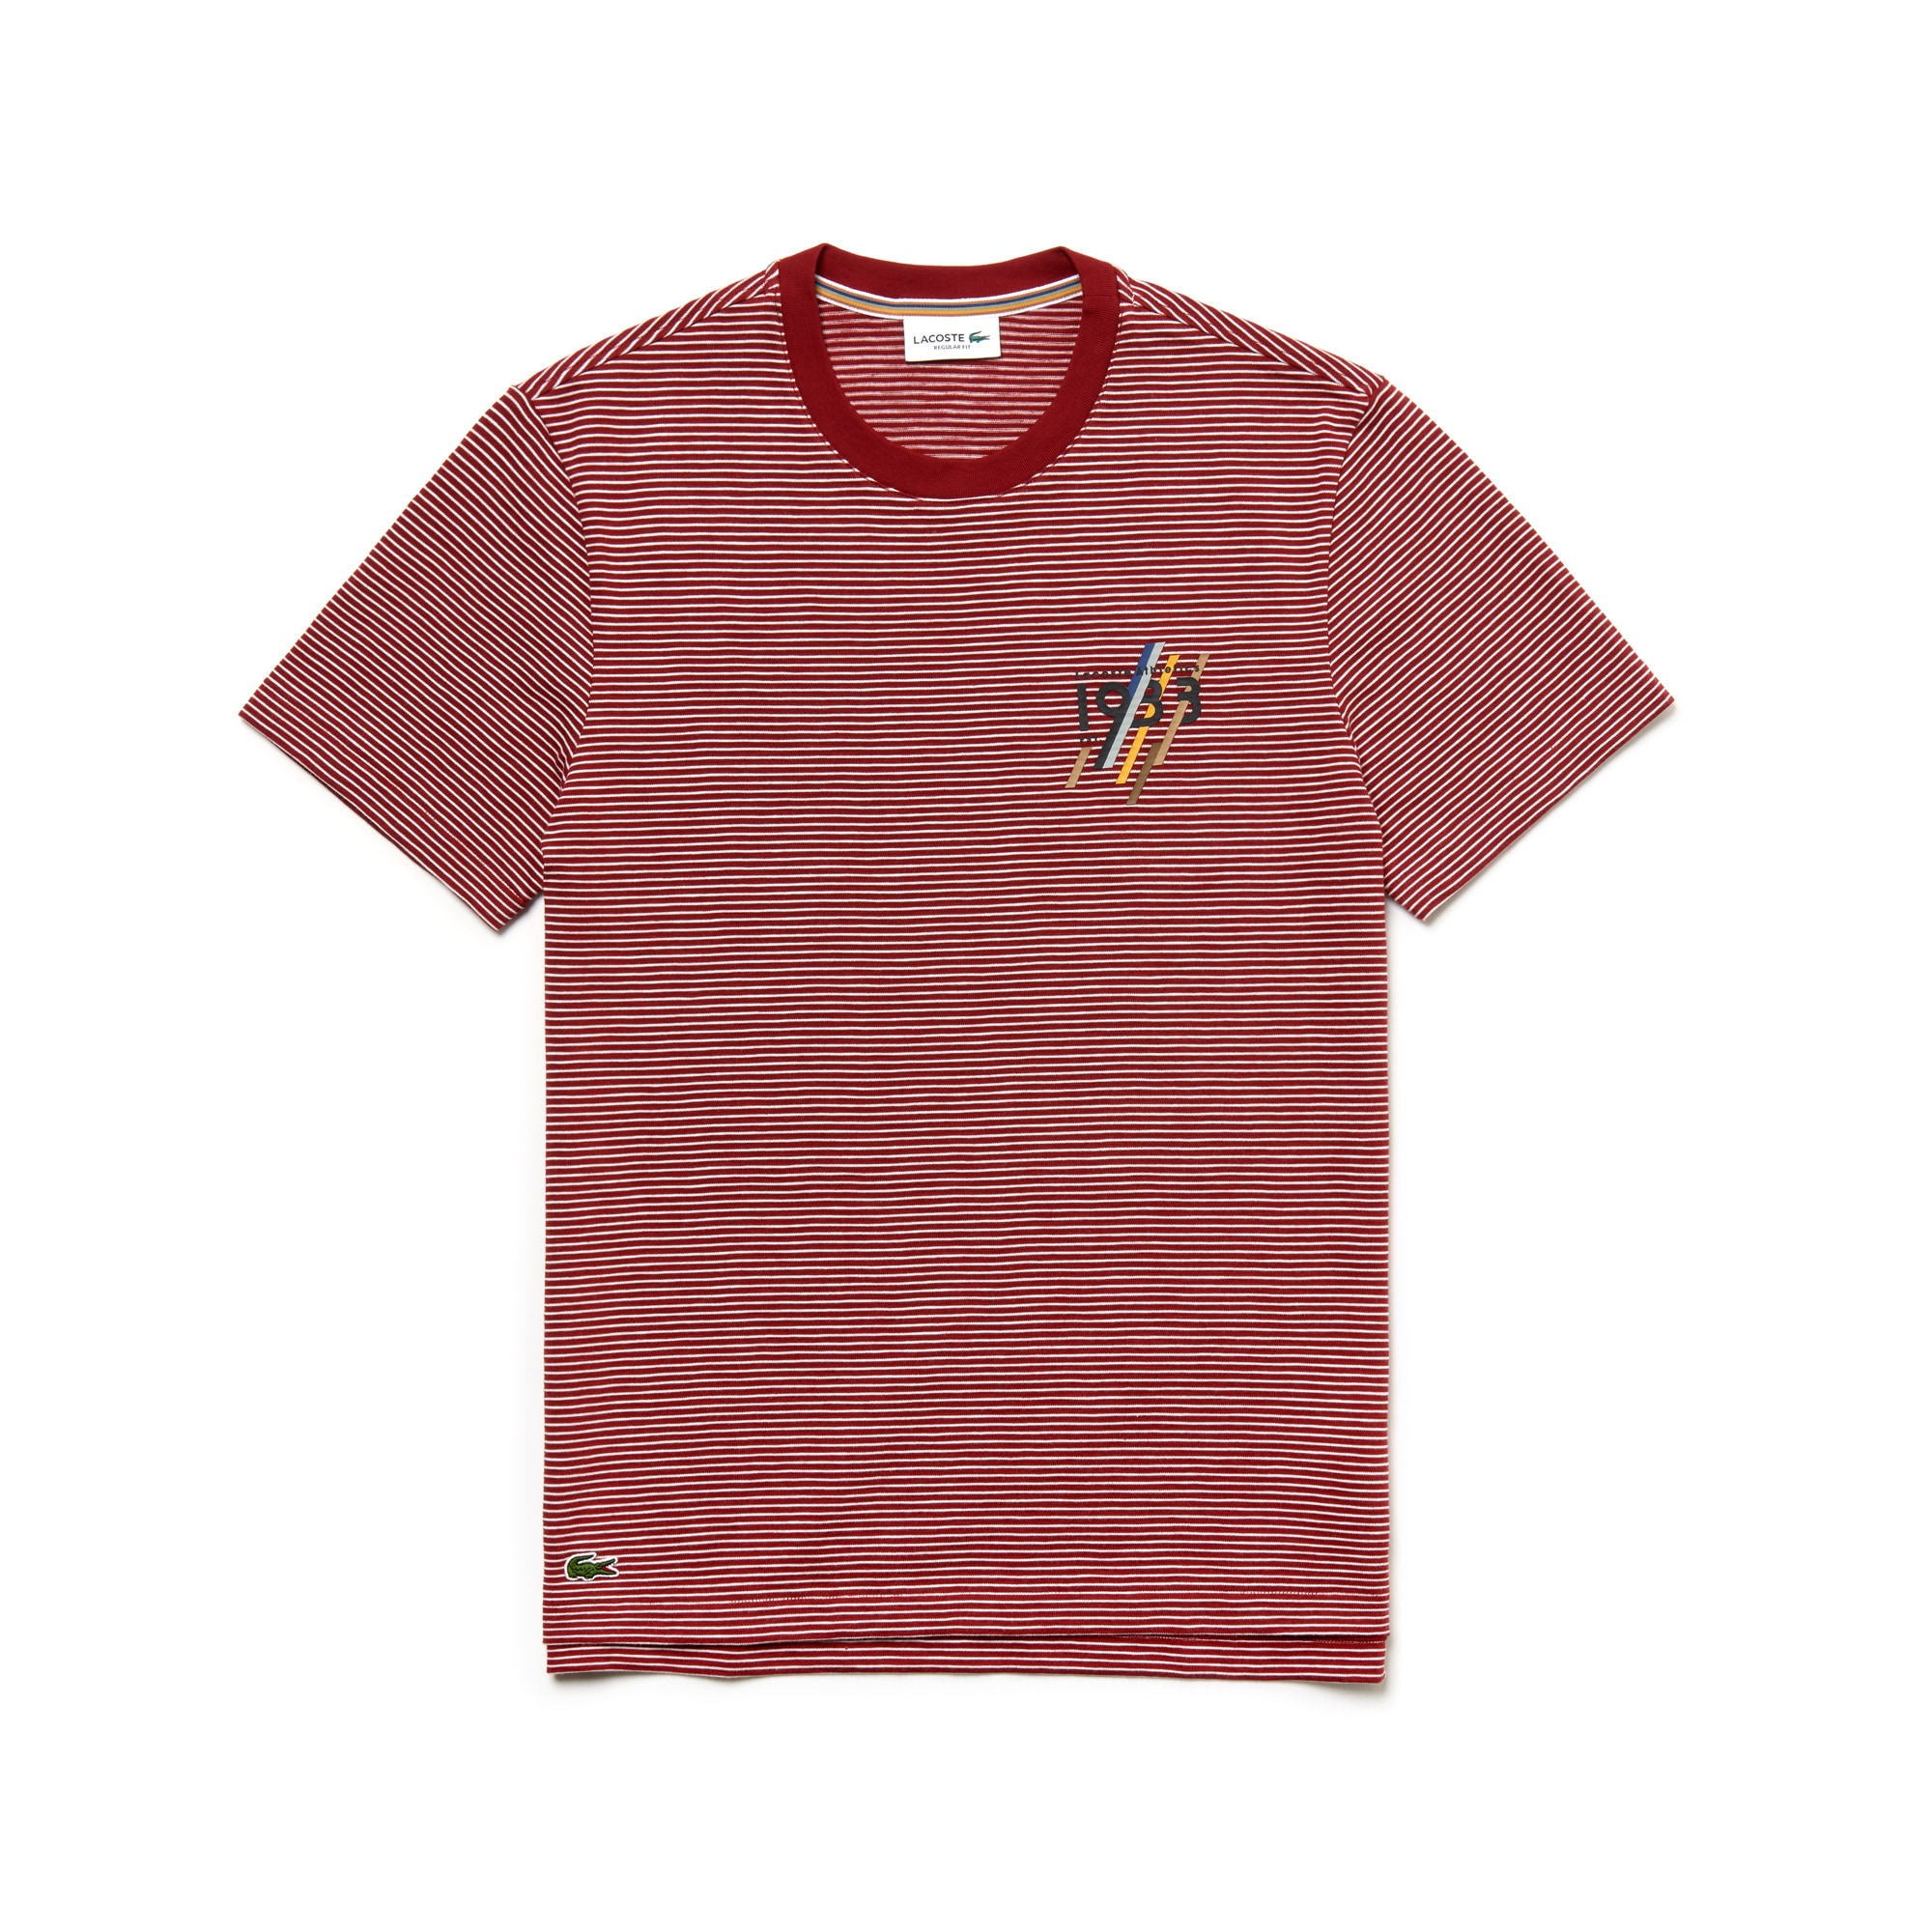 847ba07f954f Men s Clothing on Sale